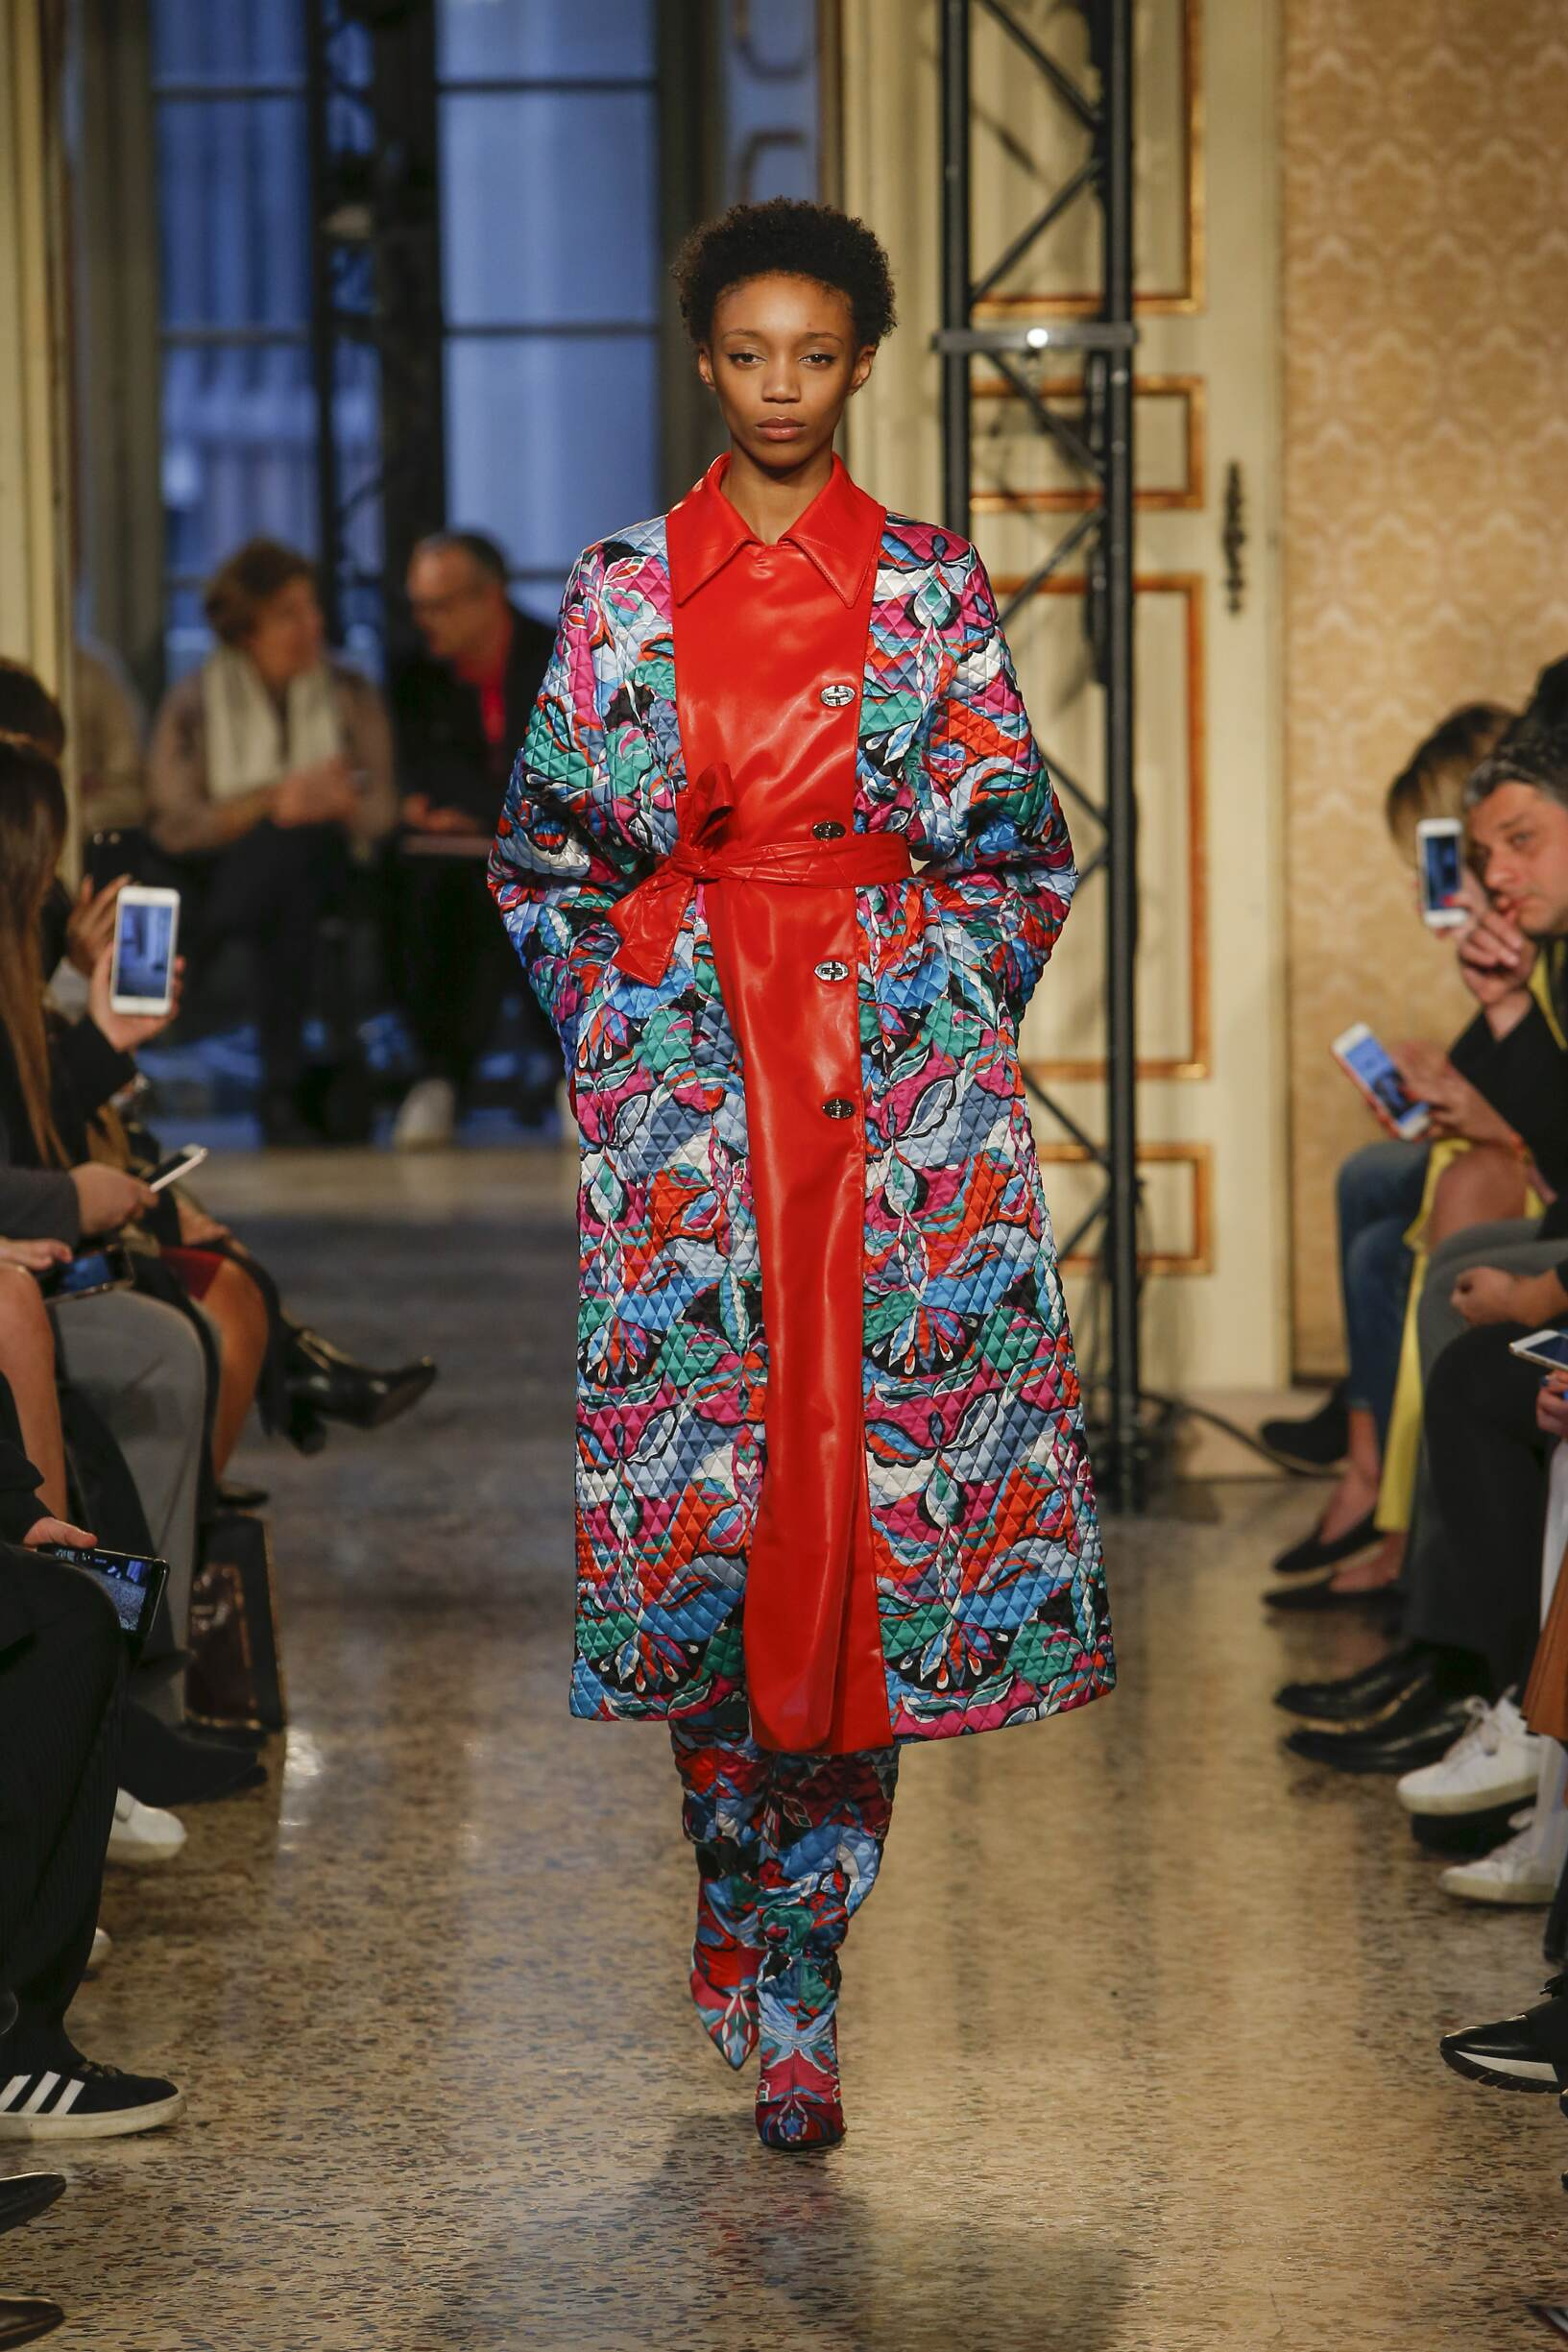 Fashion Model Emilio Pucci Catwalk